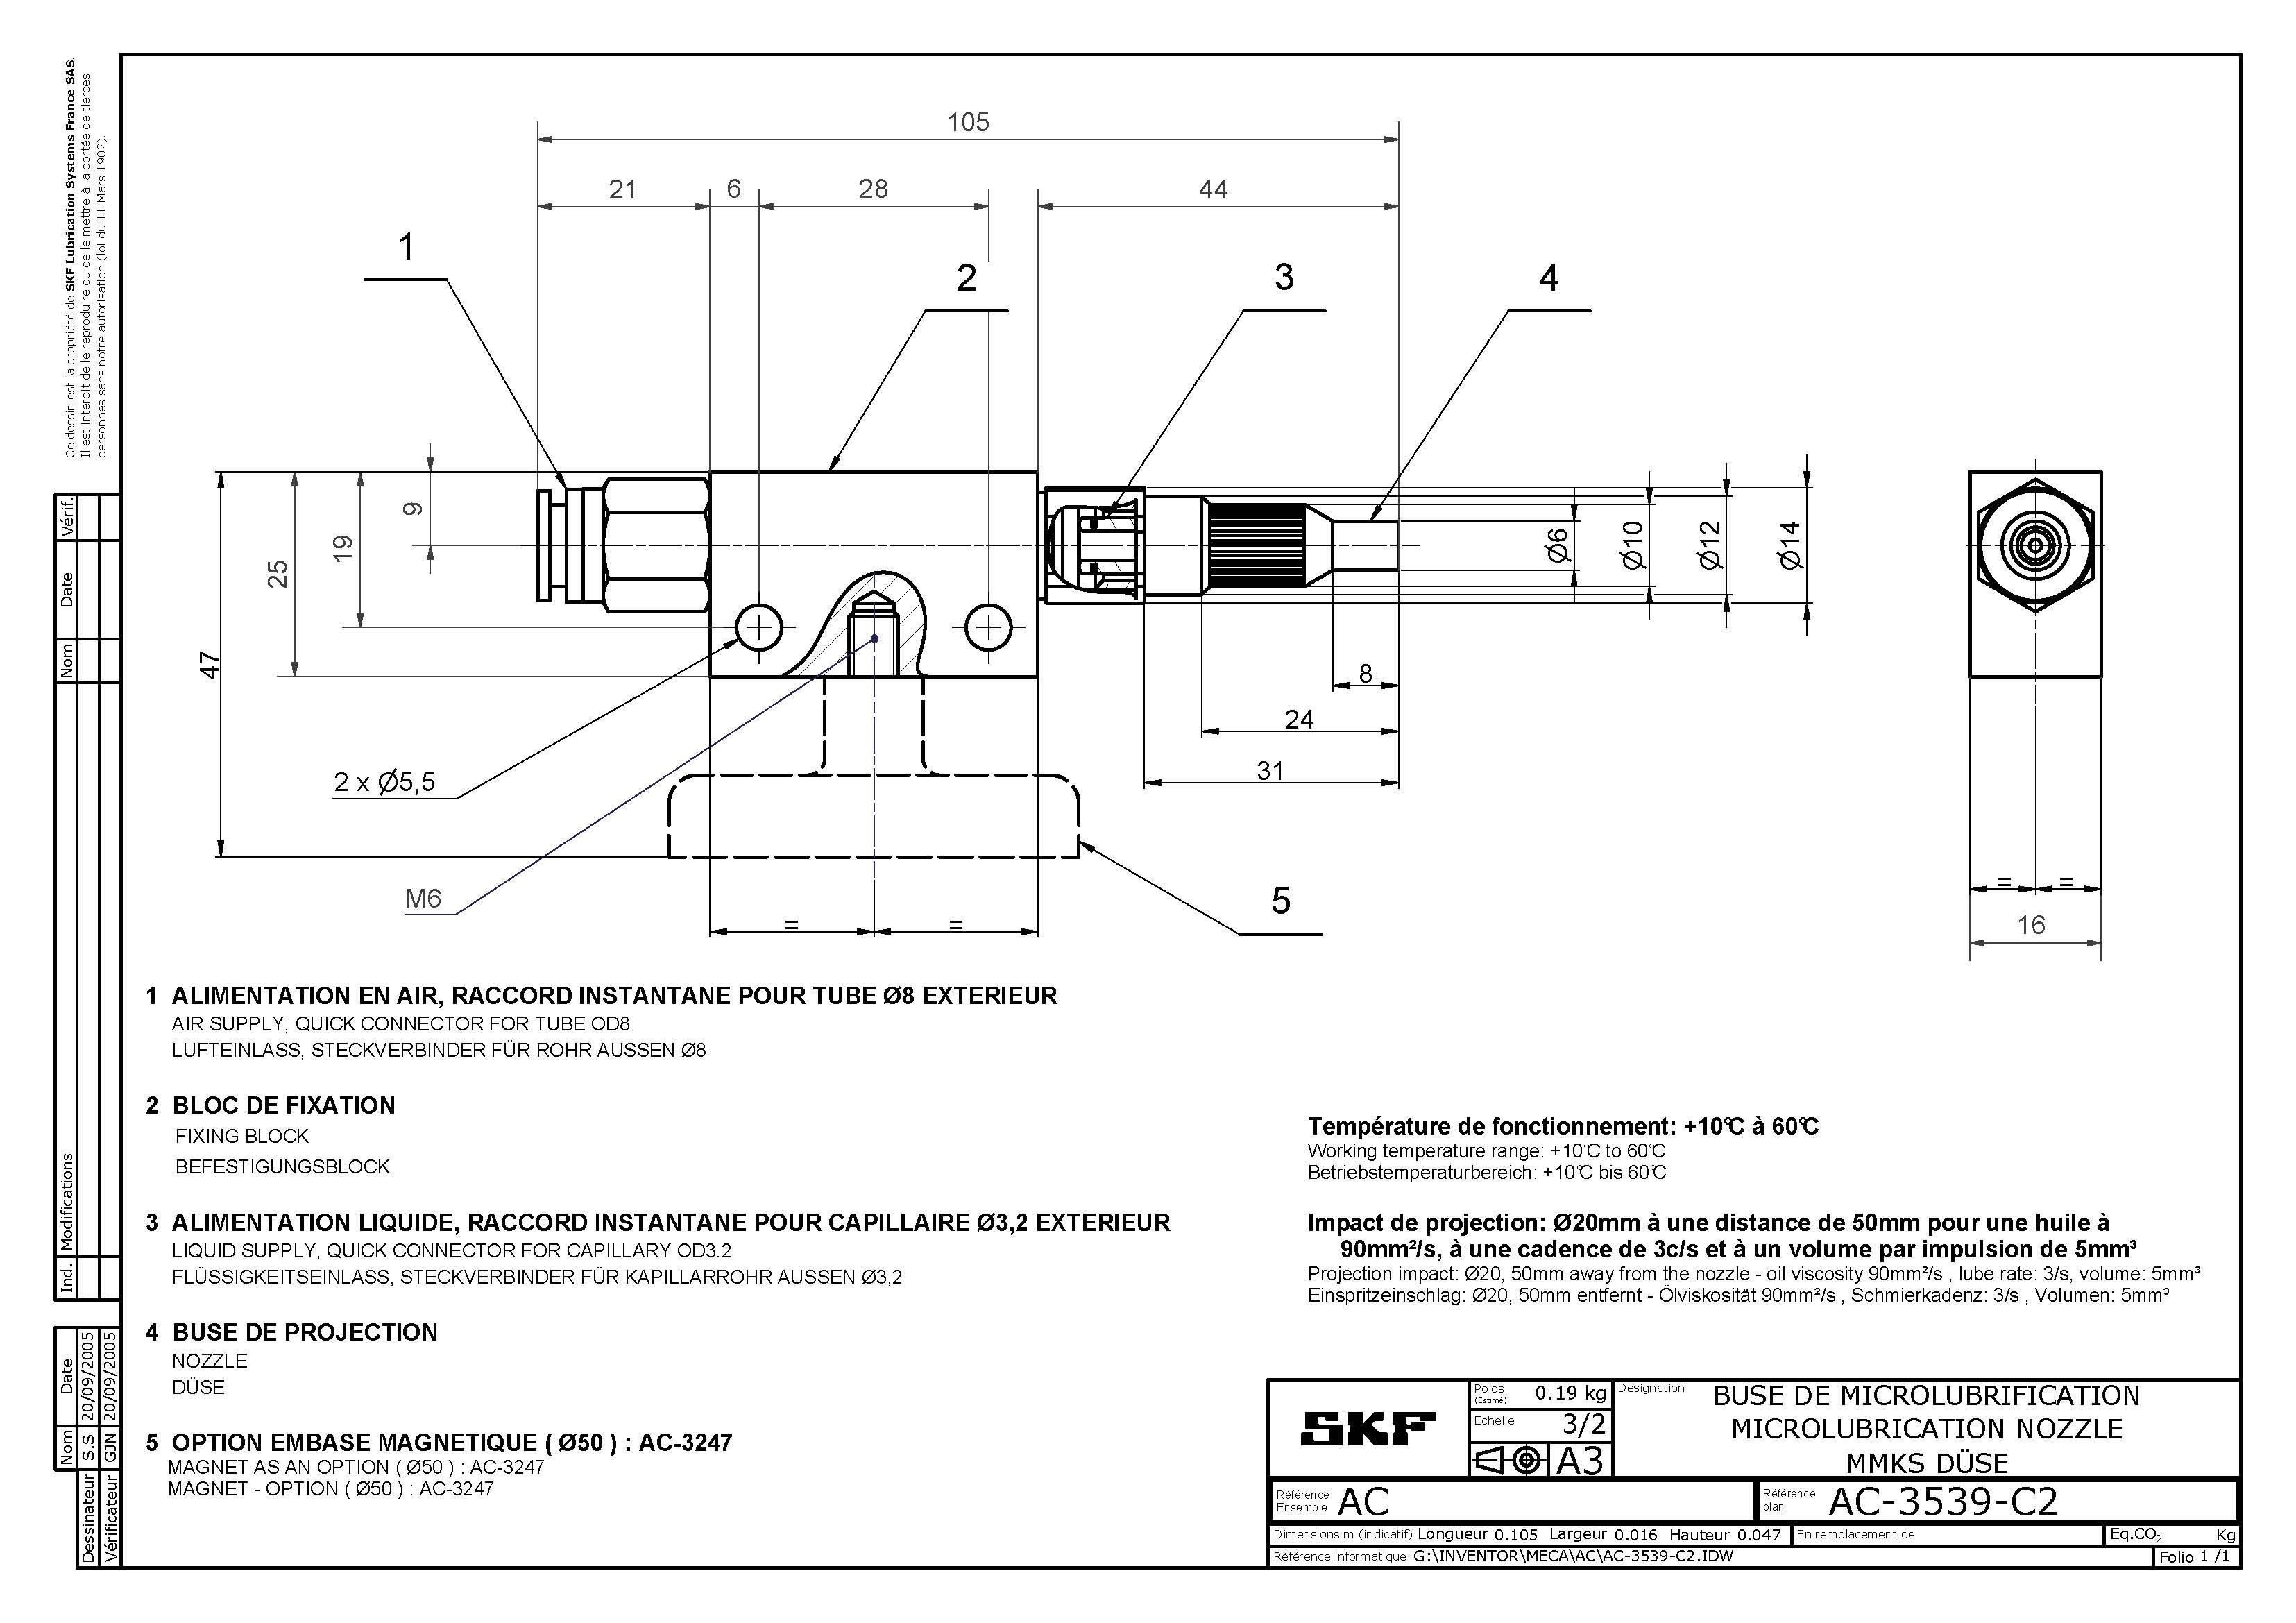 AC-3539-C2.jpg